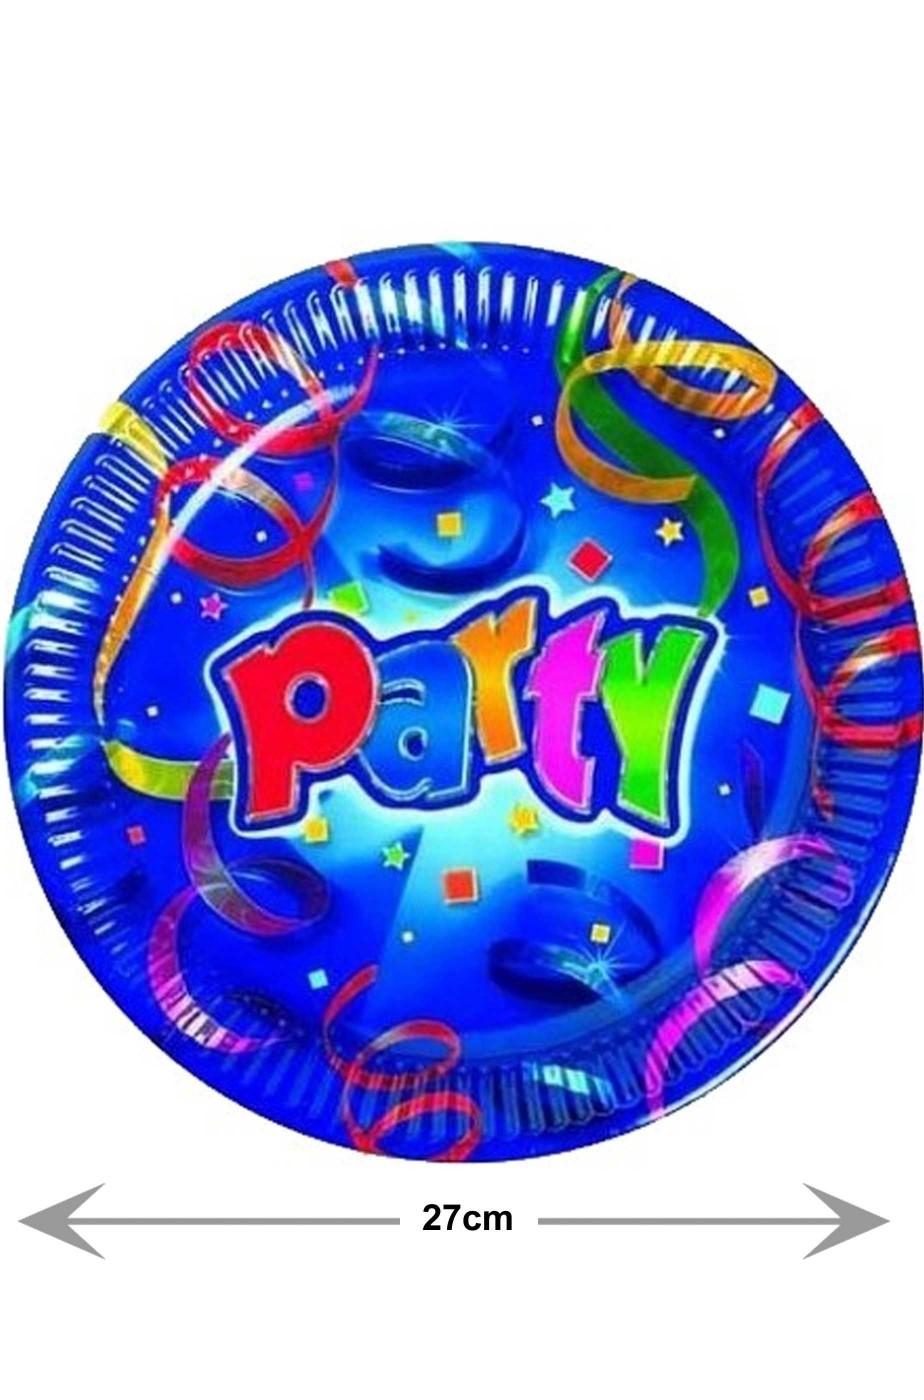 Blu Party Piatti piani di carta primo o secondo blu 8pzx27cm